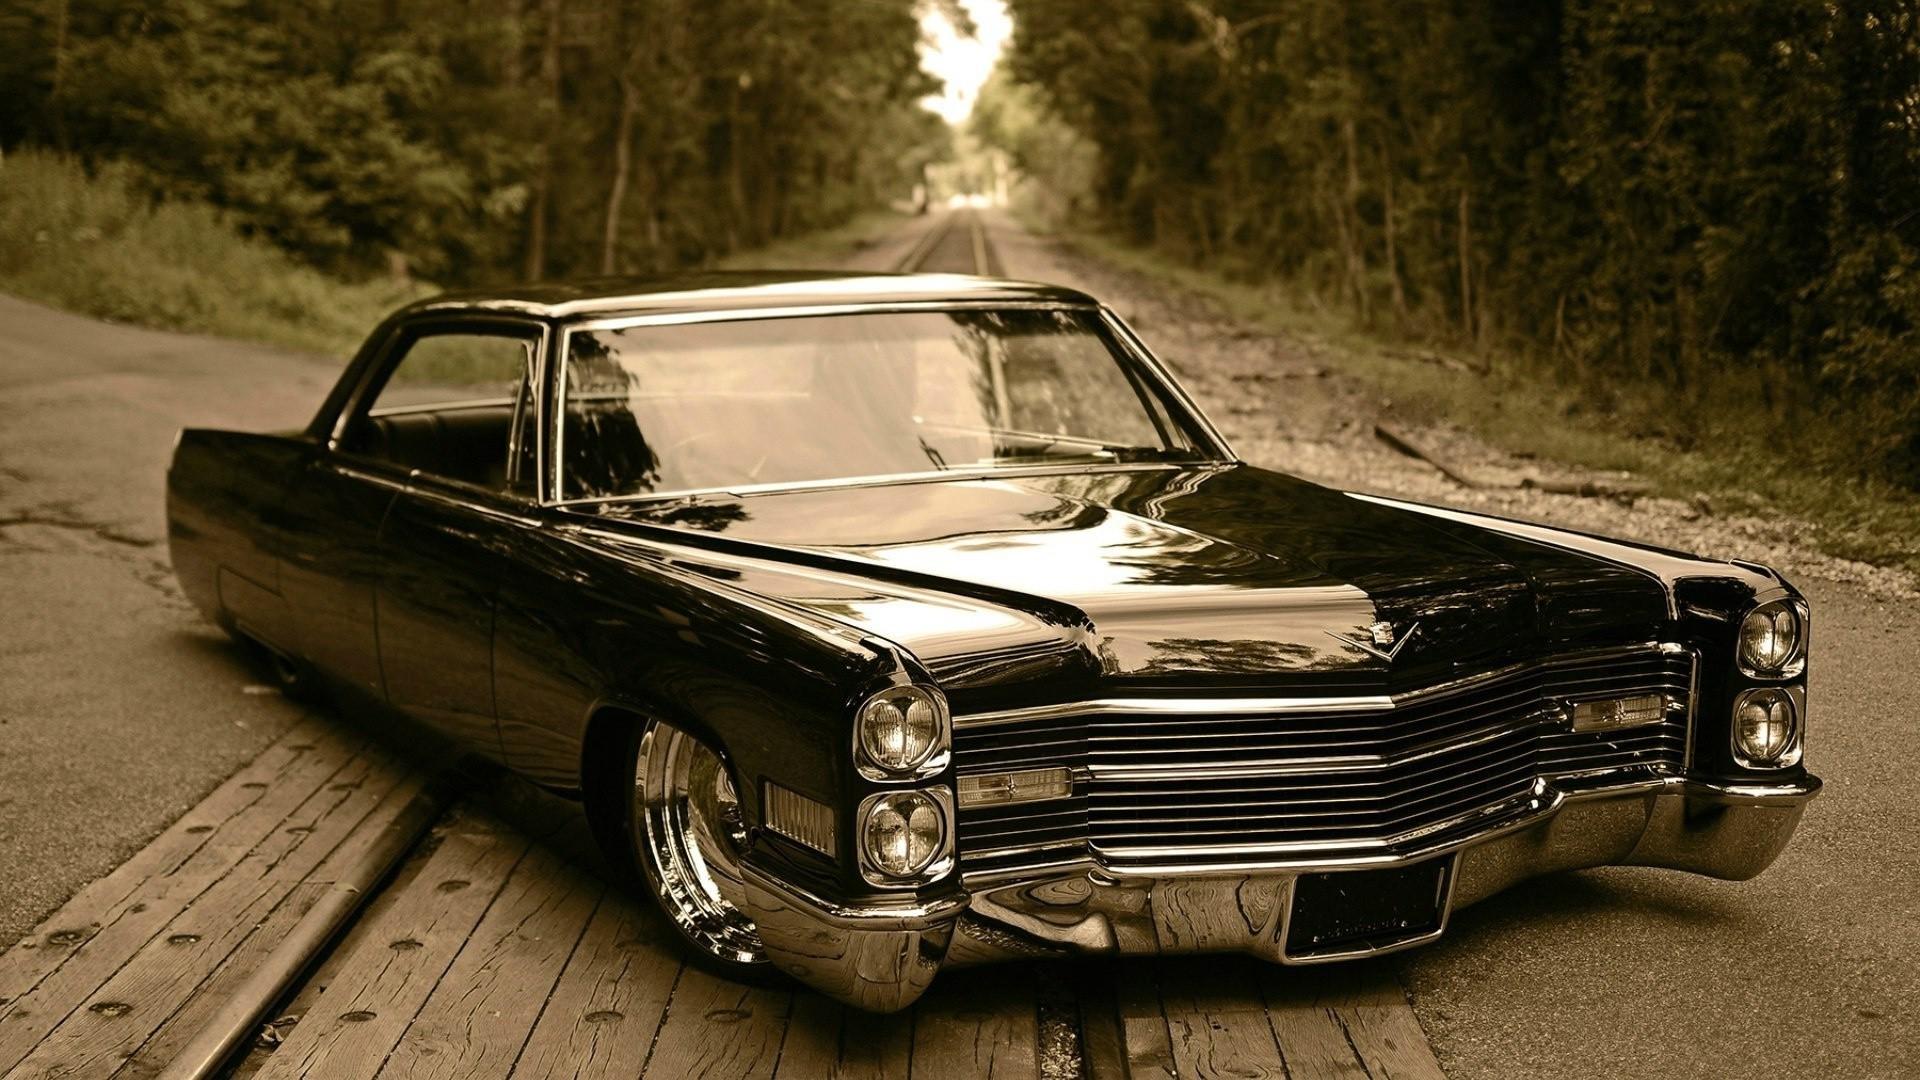 Cadillac wallpapers wallpapertag - Cadillac wallpaper ...